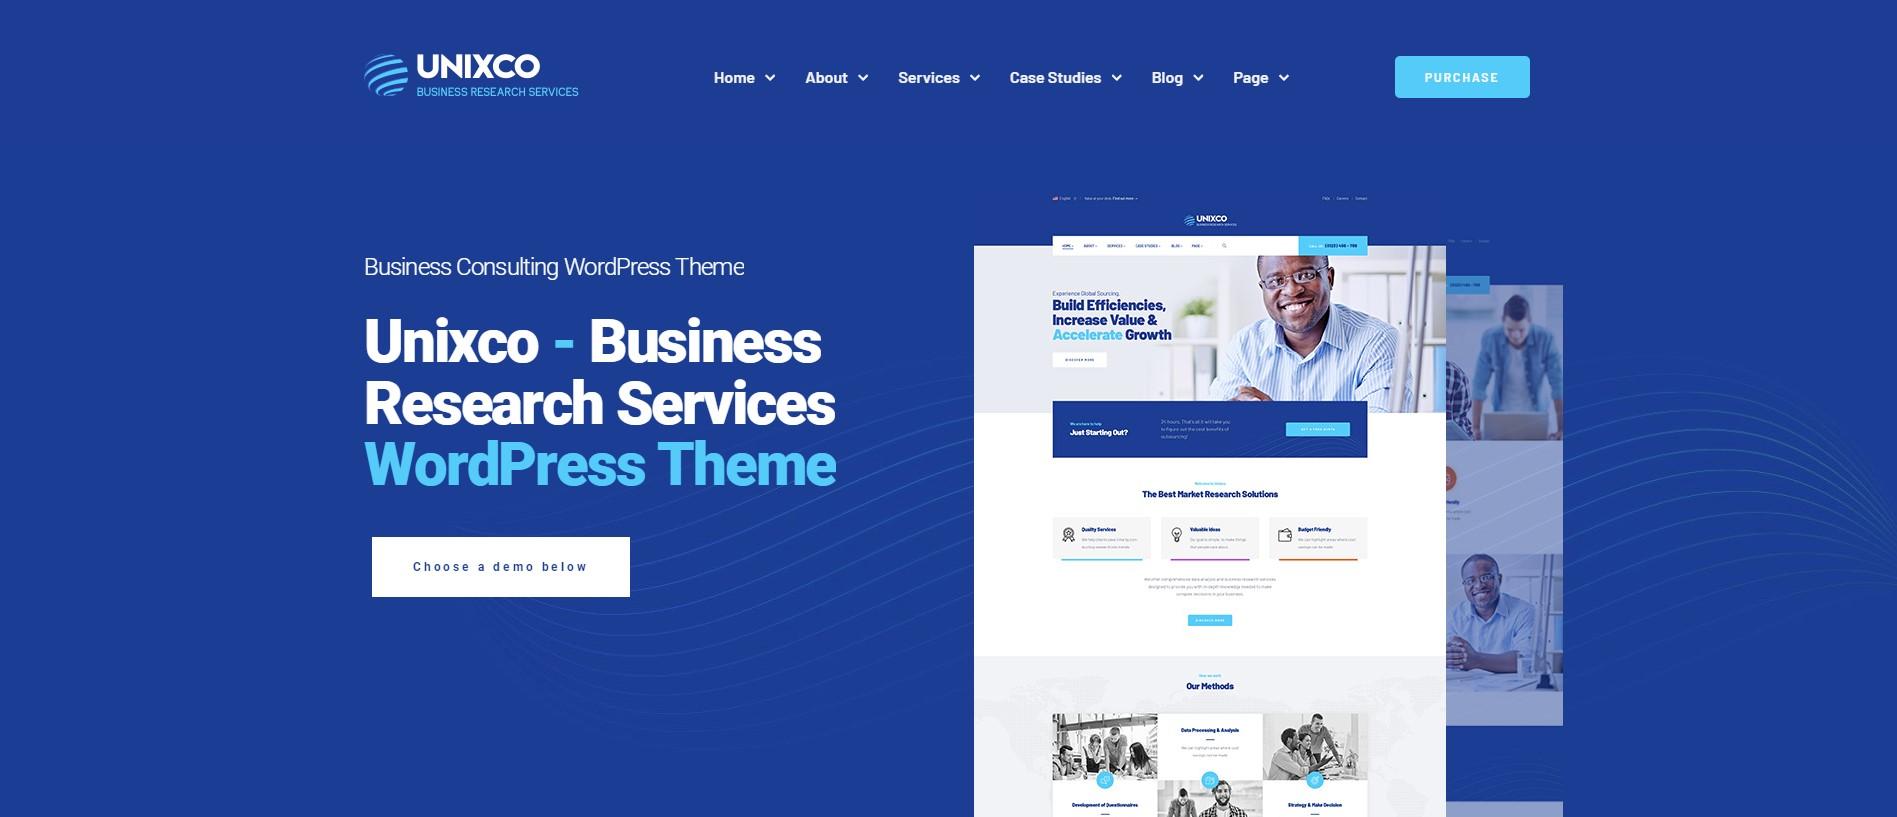 Unixco Best Business Research Service WordPress Theme